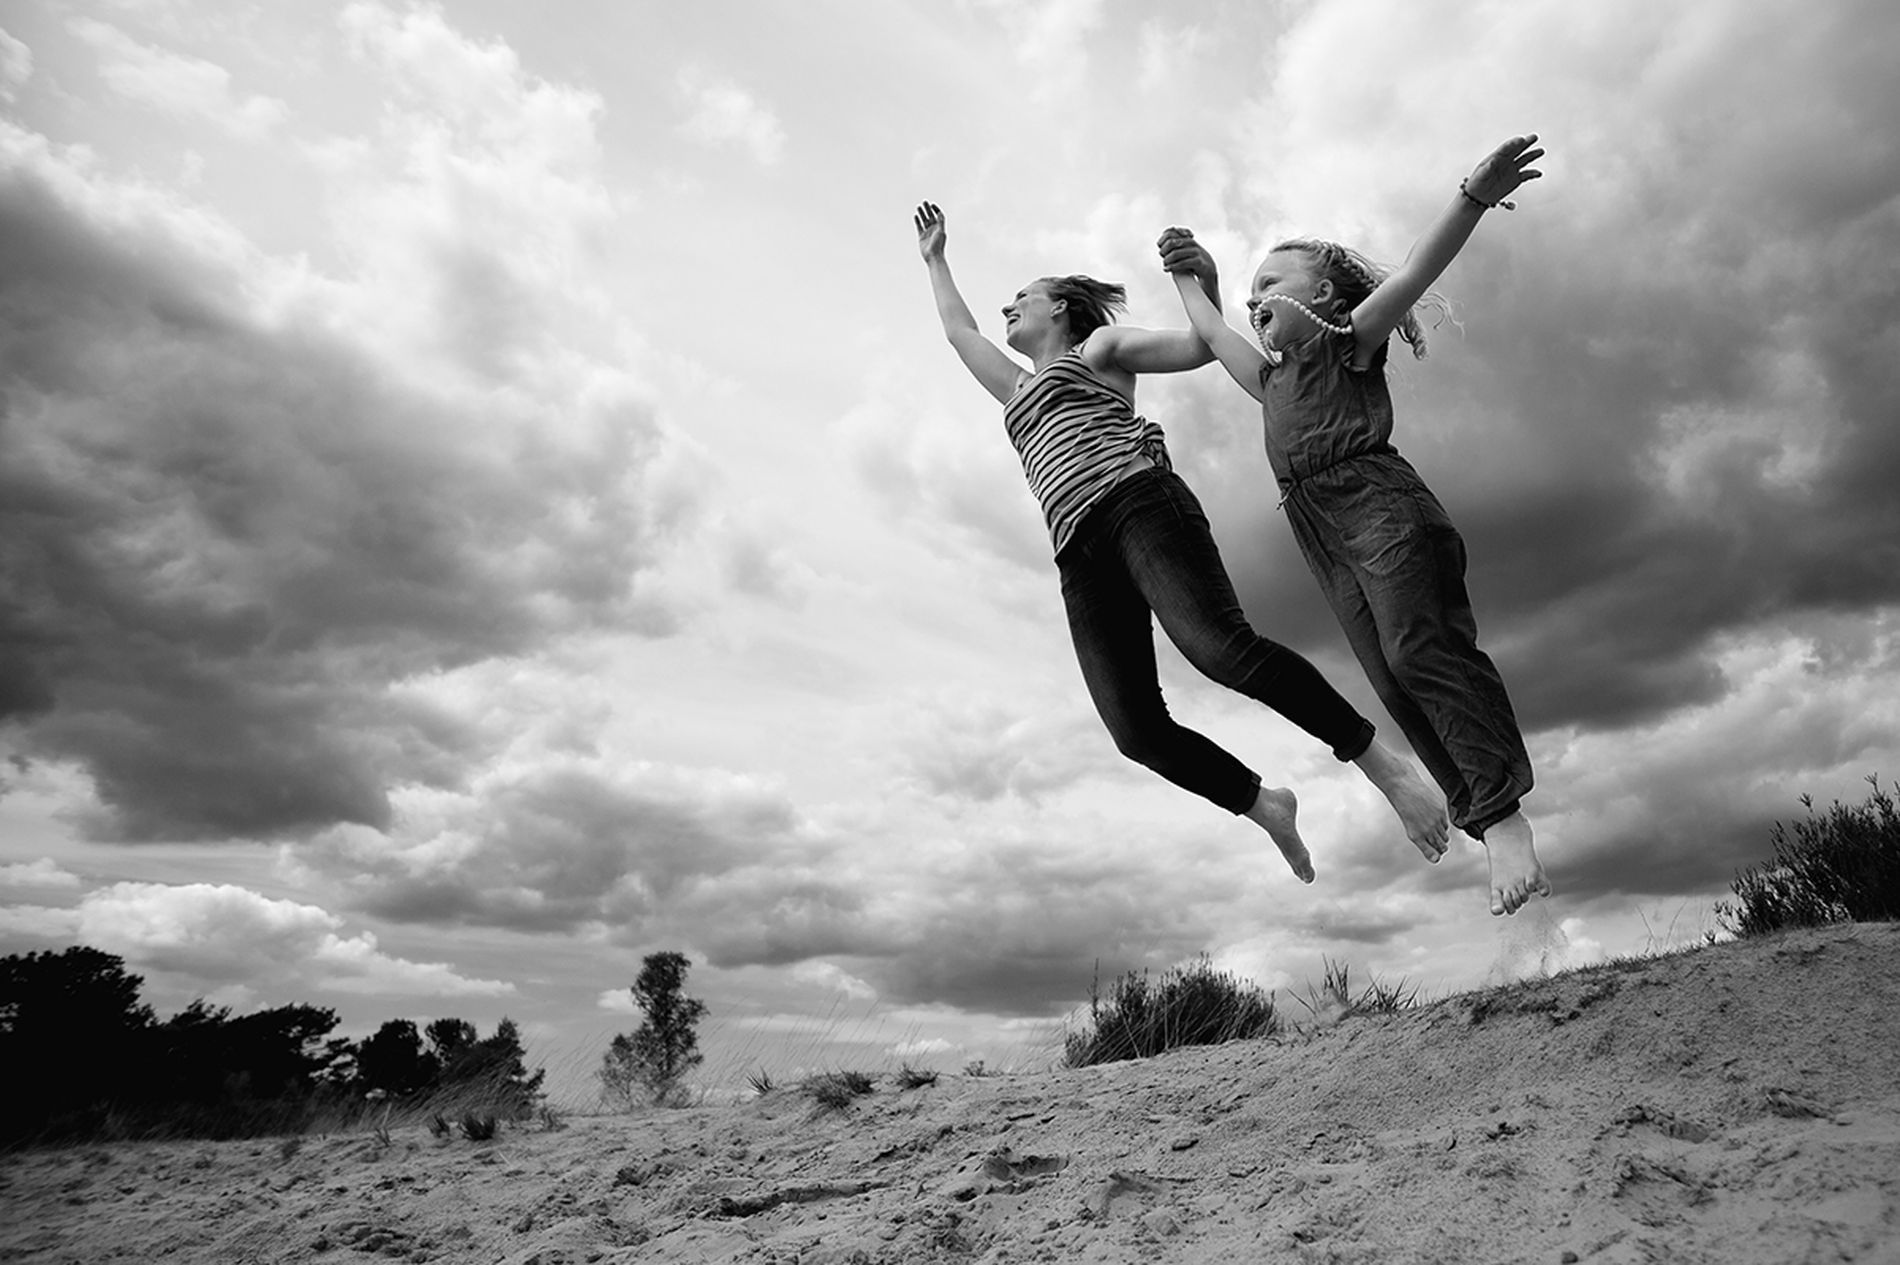 Bart-Boodts-3 MCP Actions Sponsored GuruShots Motherhood Photo Challenge Winners Contests